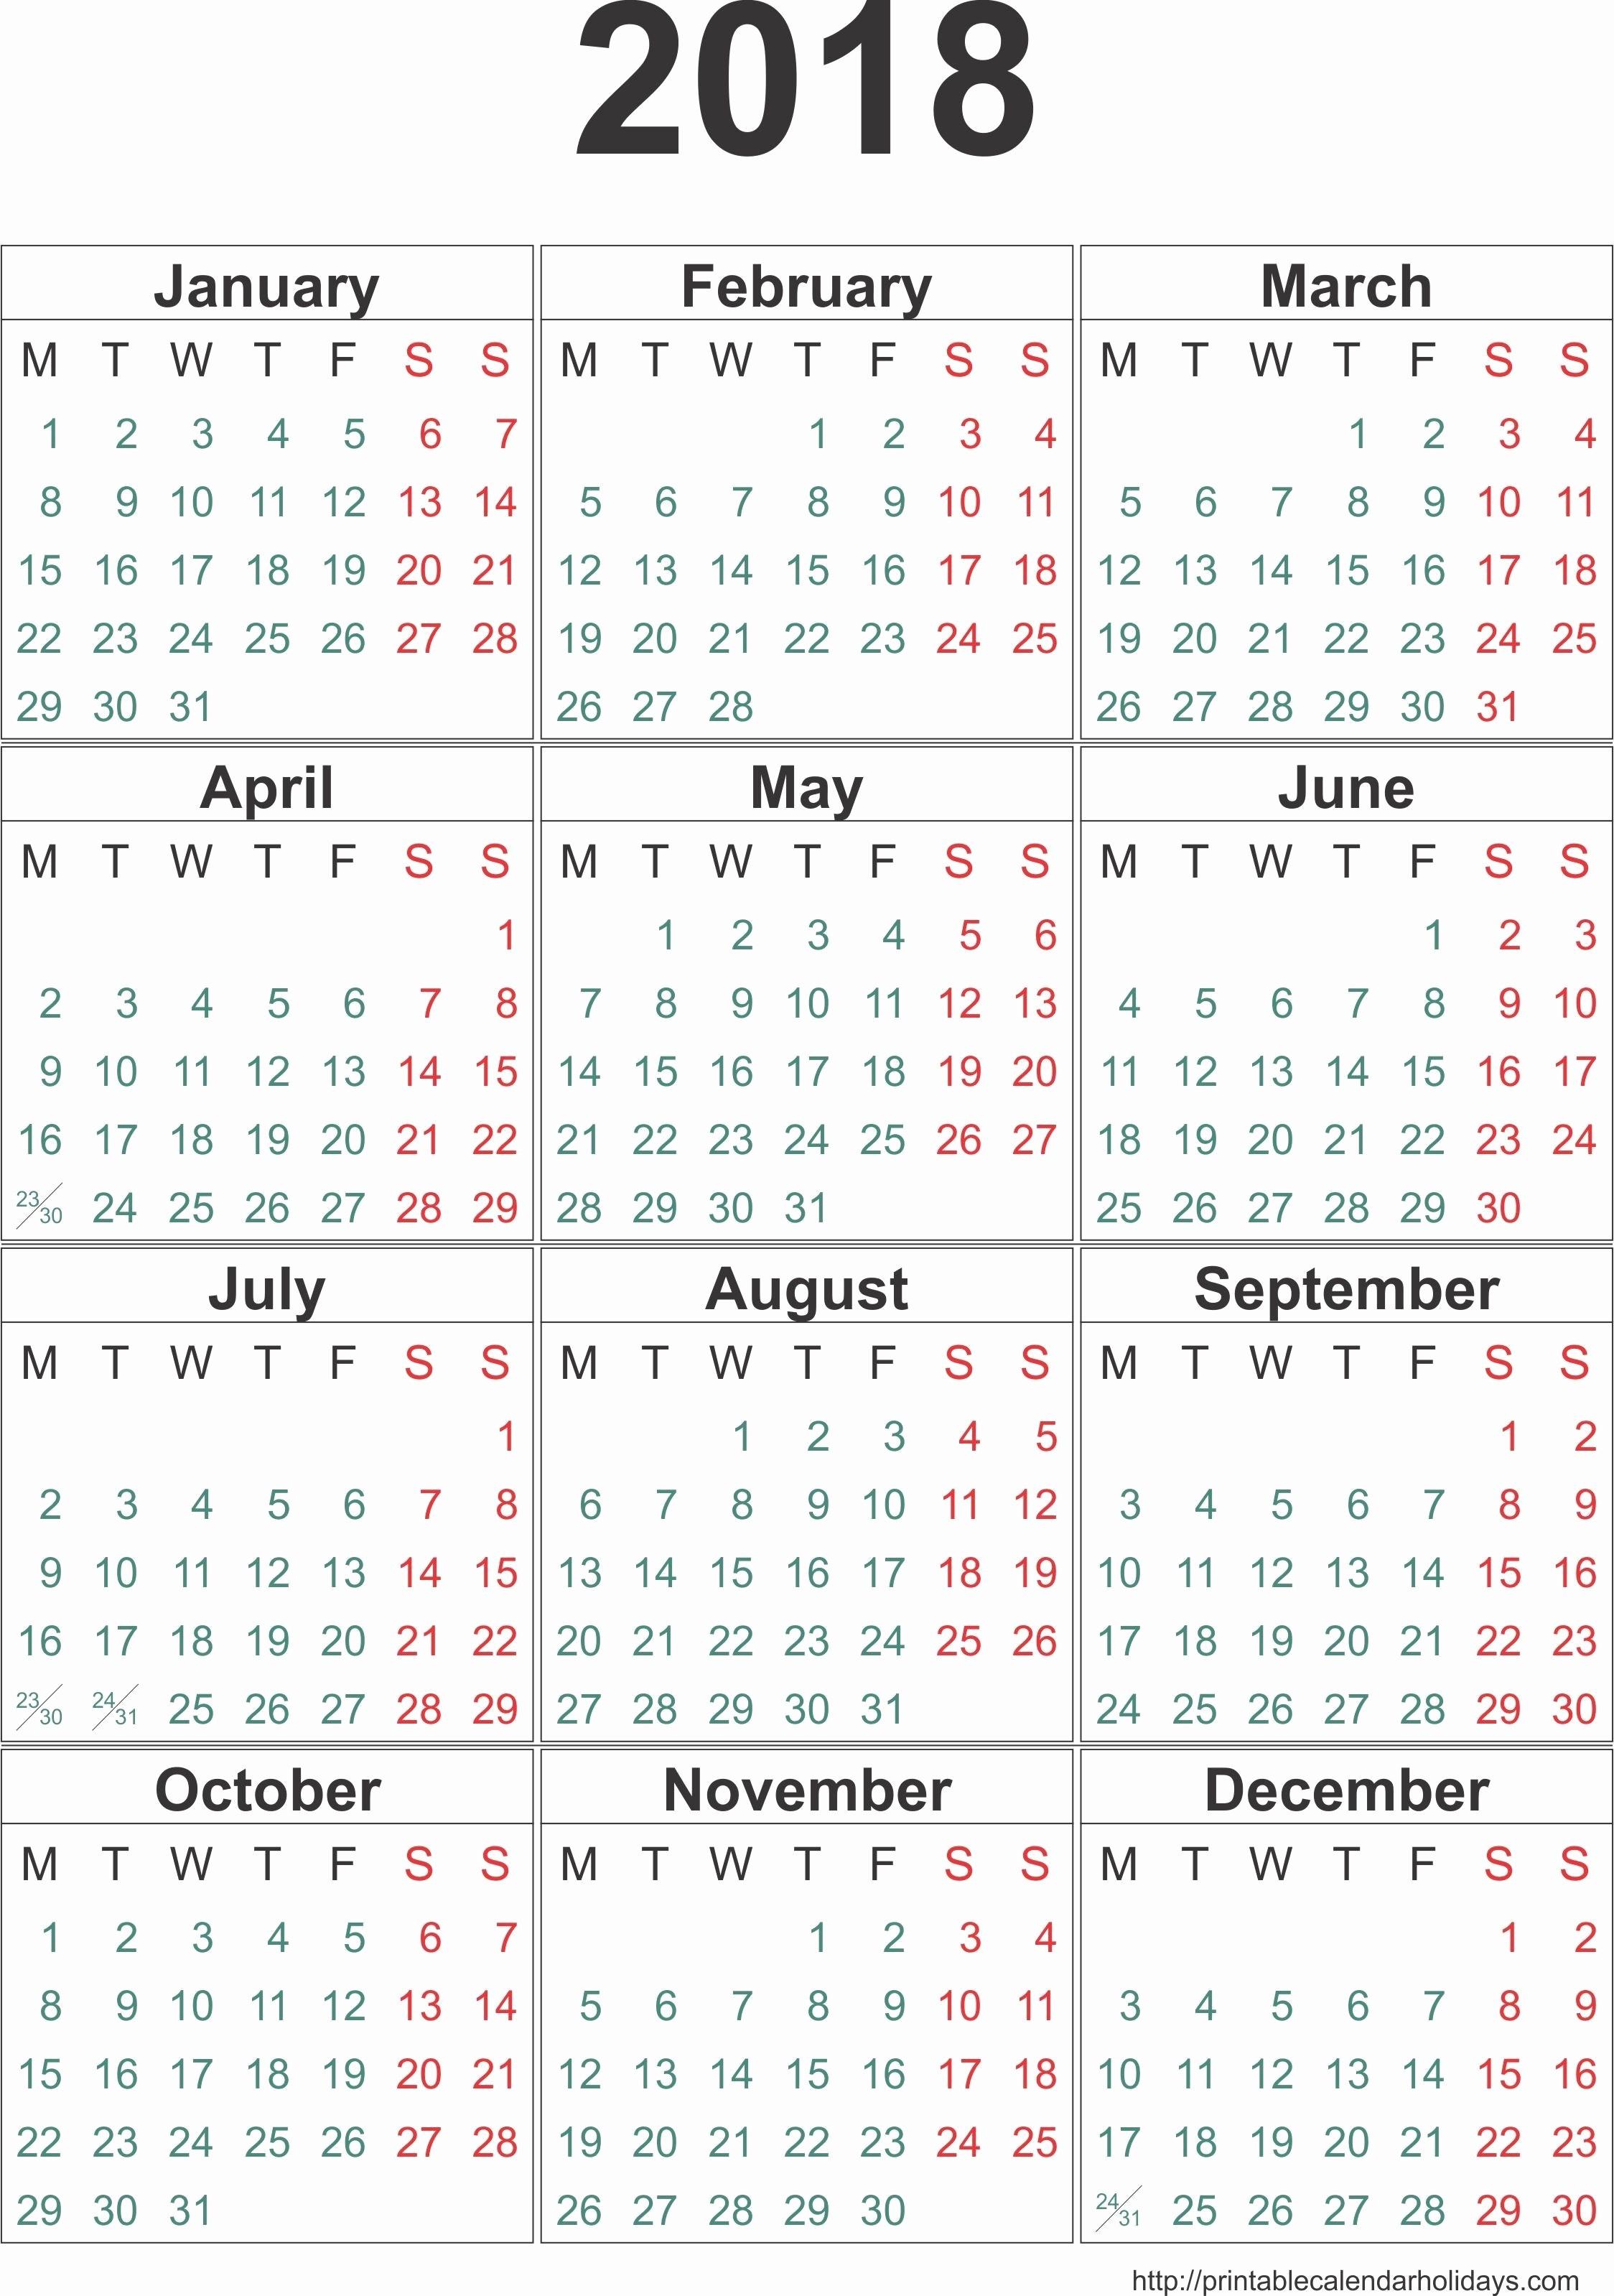 2017 12 Month Calendar Printable New 12 Month Calendar E Page 2018 – Calendar Printable